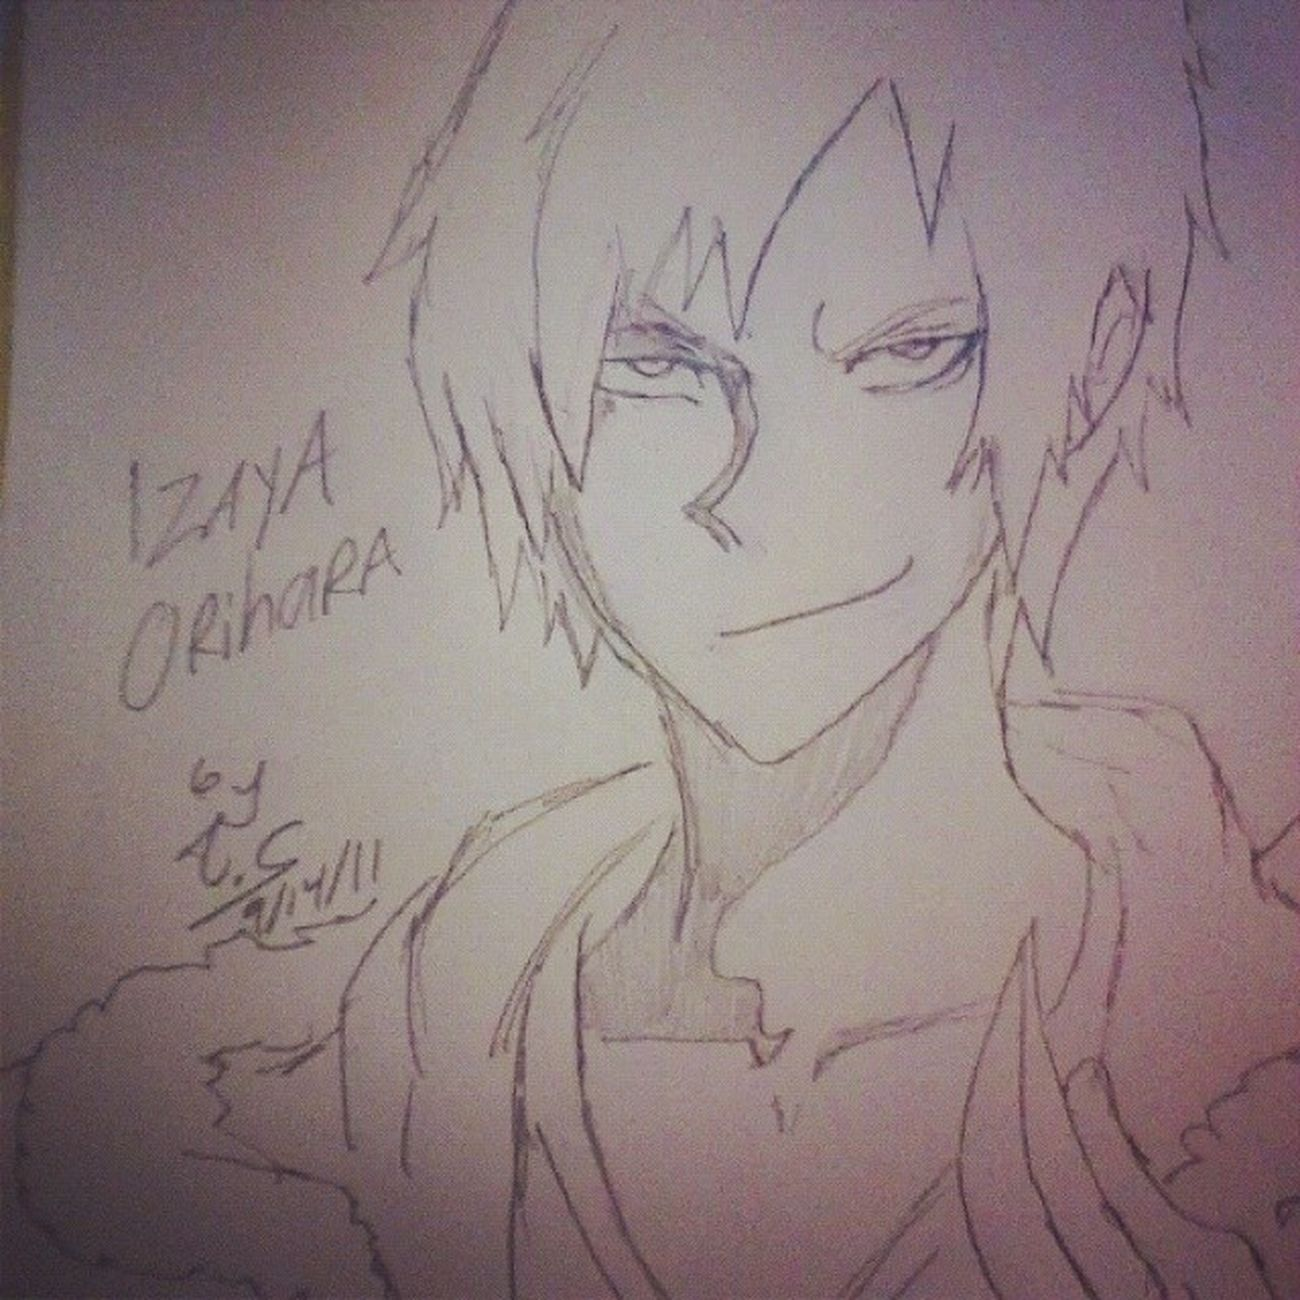 Old sketch of Izaya from Durarara Anime Durarara Sketch Art IzayaOrihara